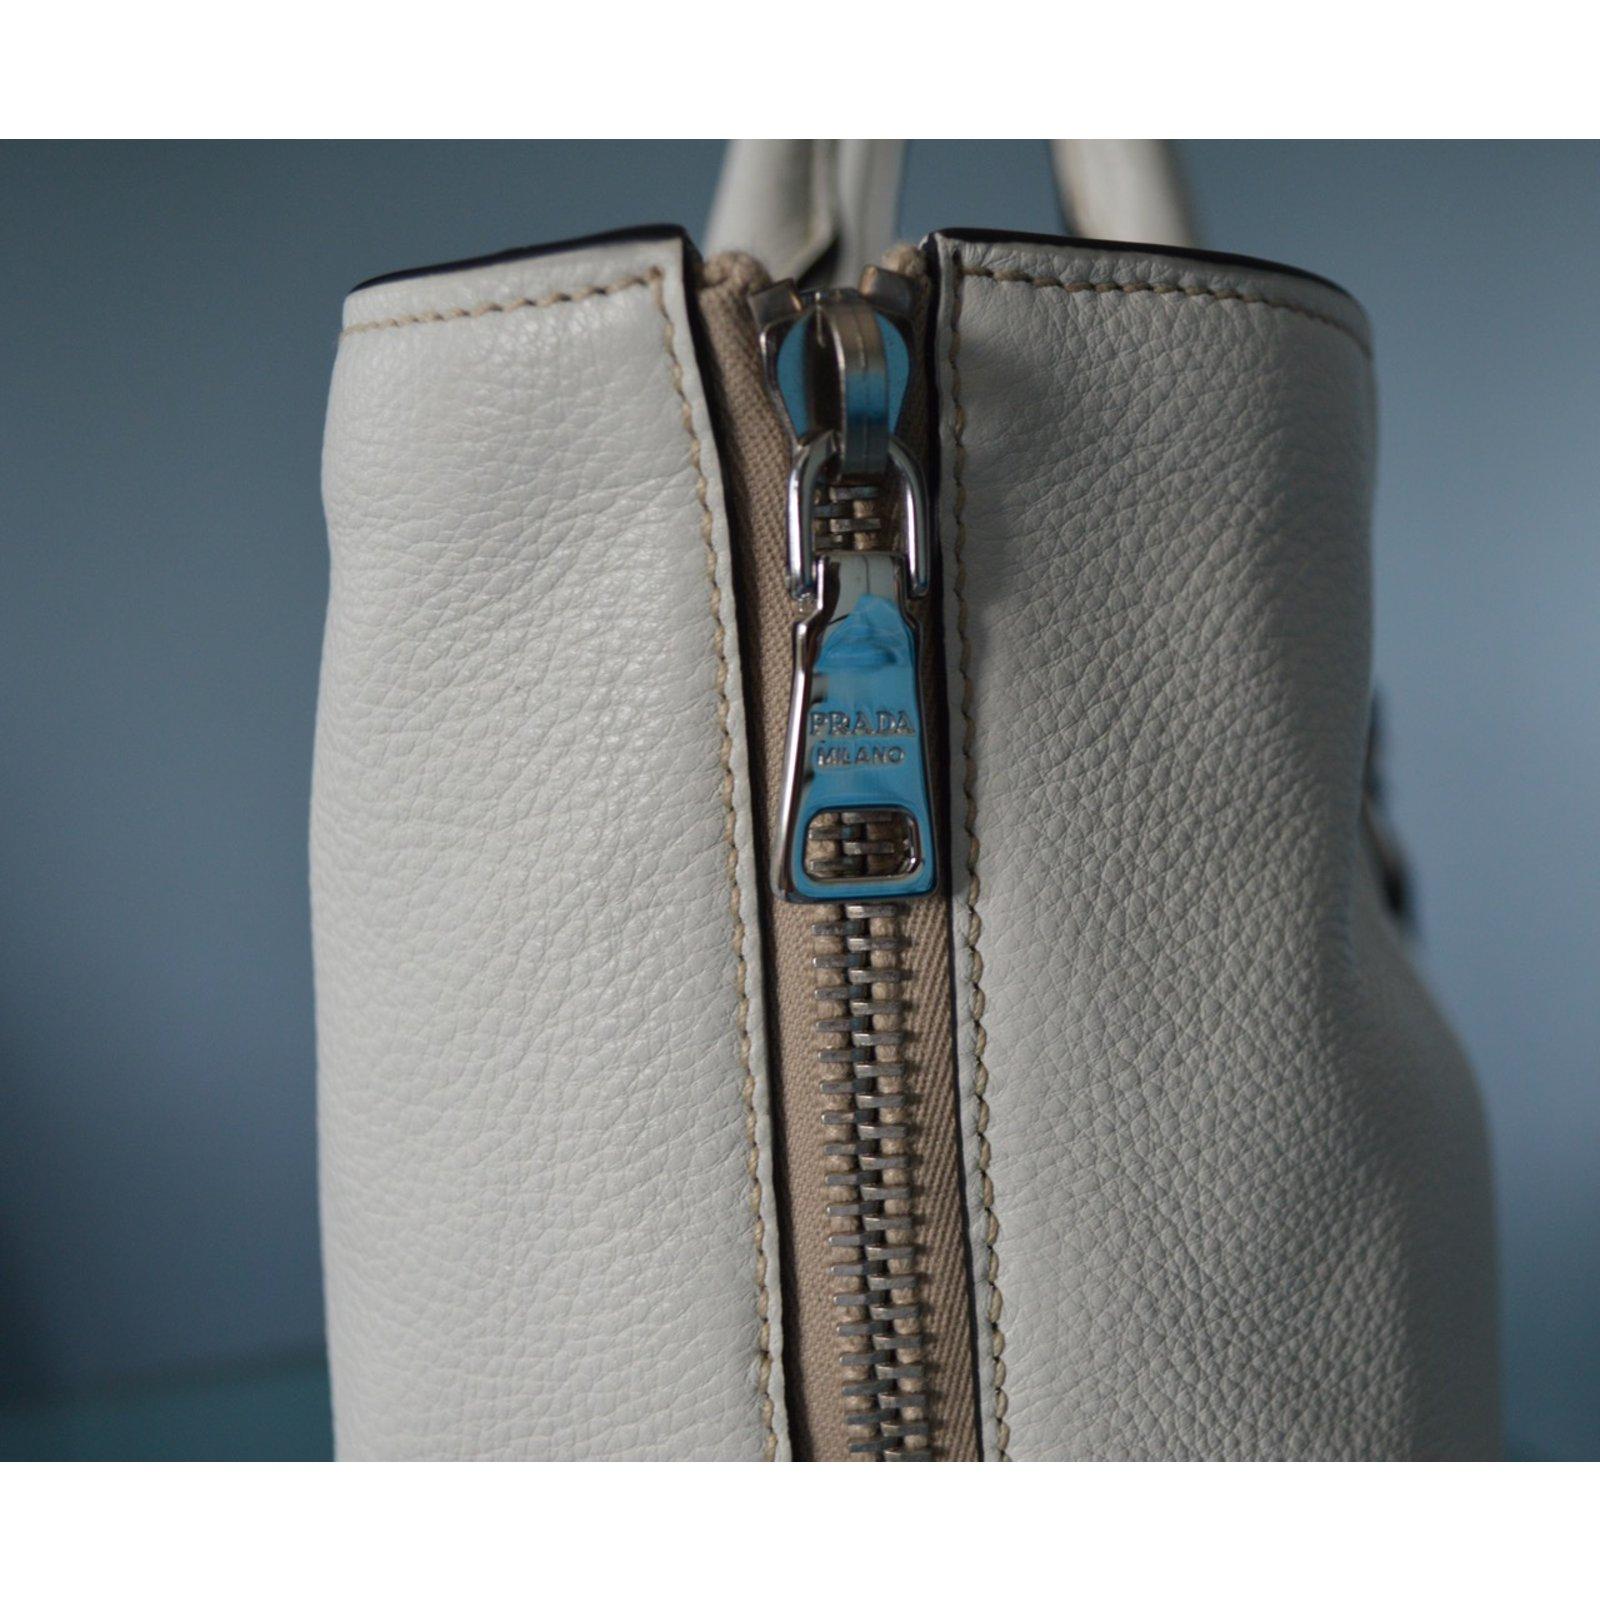 ... nylon Black ref.76590 - Joli C buy online 837eb  Prada Prada vitello  phenix talco textured leather shopping tote bag bn2419 original Handbags  Leather ... c50c5de75a